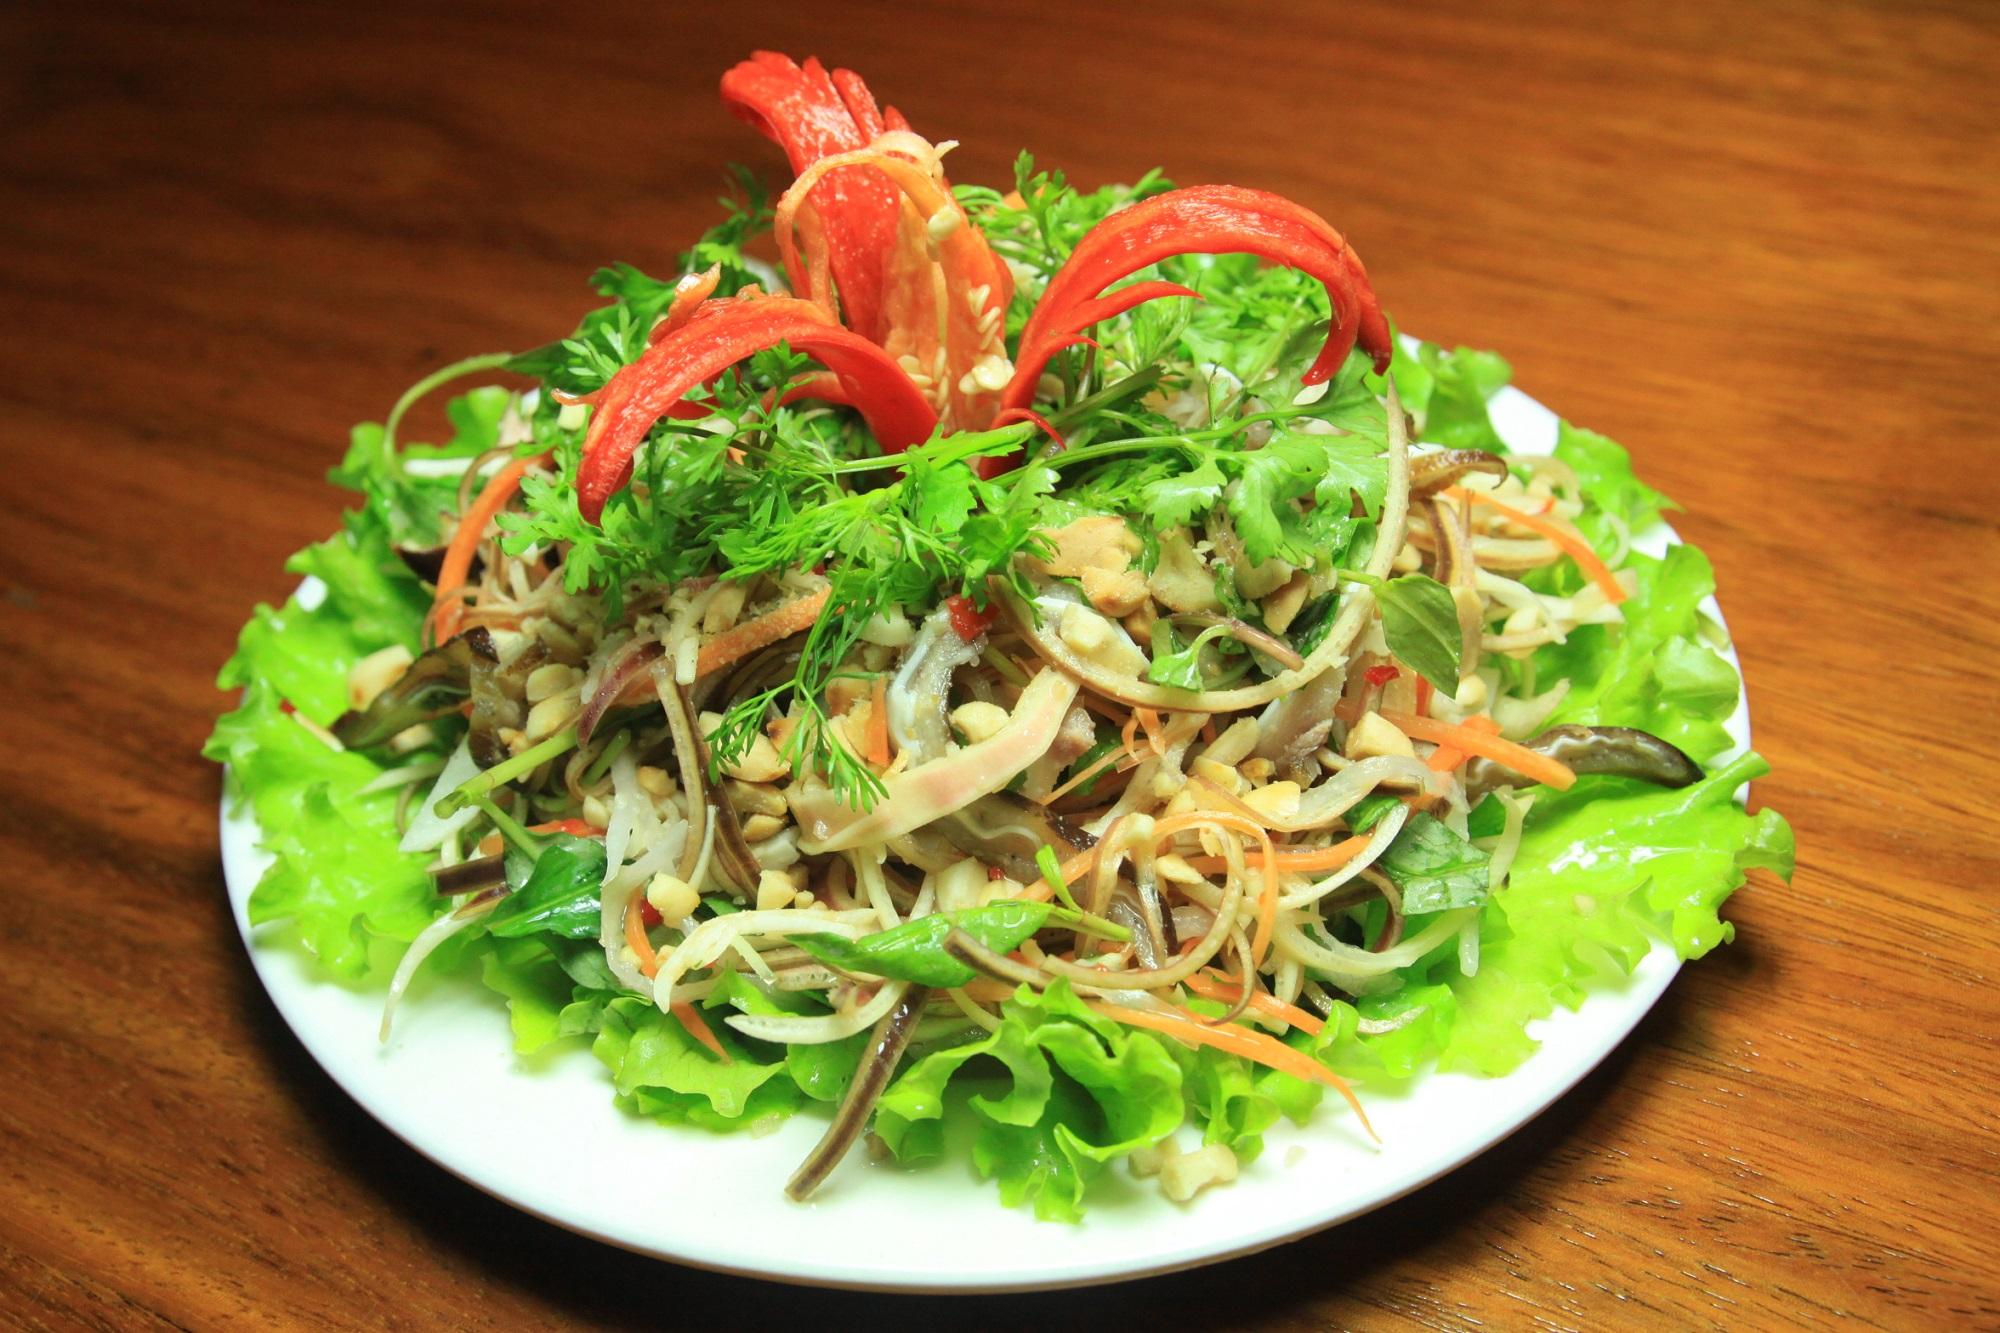 Nom Hoa Chuoi - Salade de fleurs de bananier du Vietnam